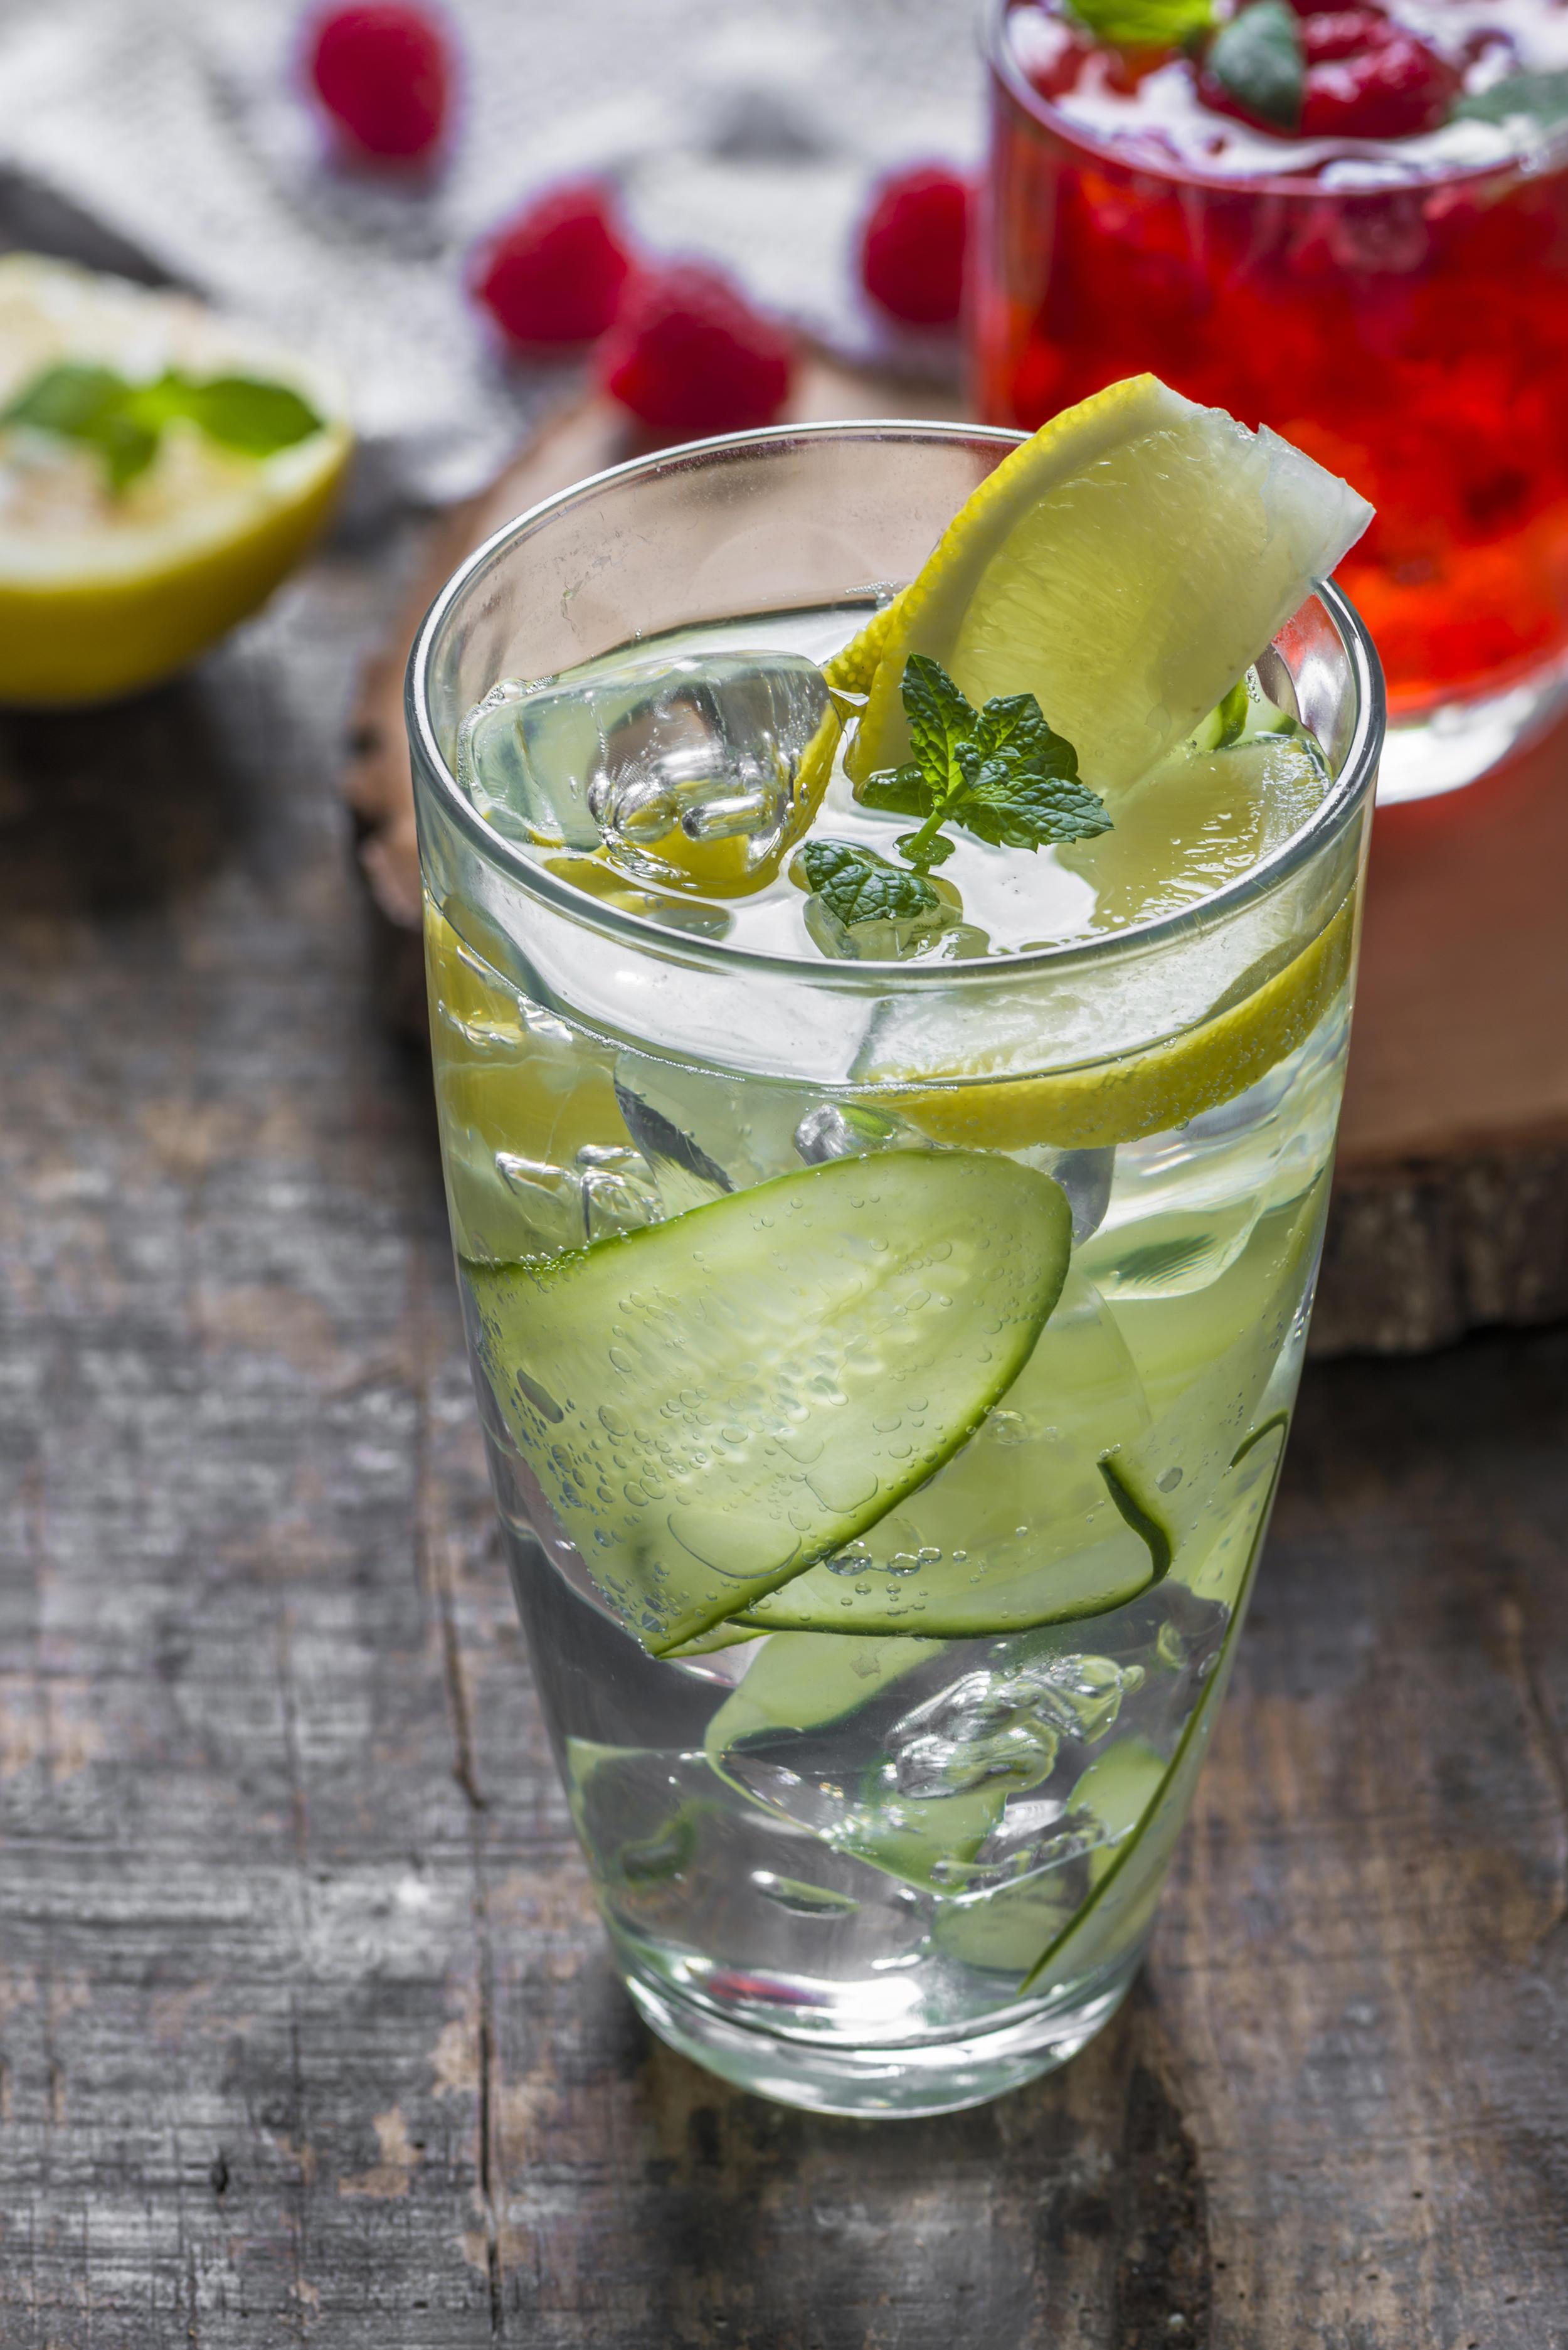 Den-perfekten-Gin-Tonic-mixen-so-geht-s